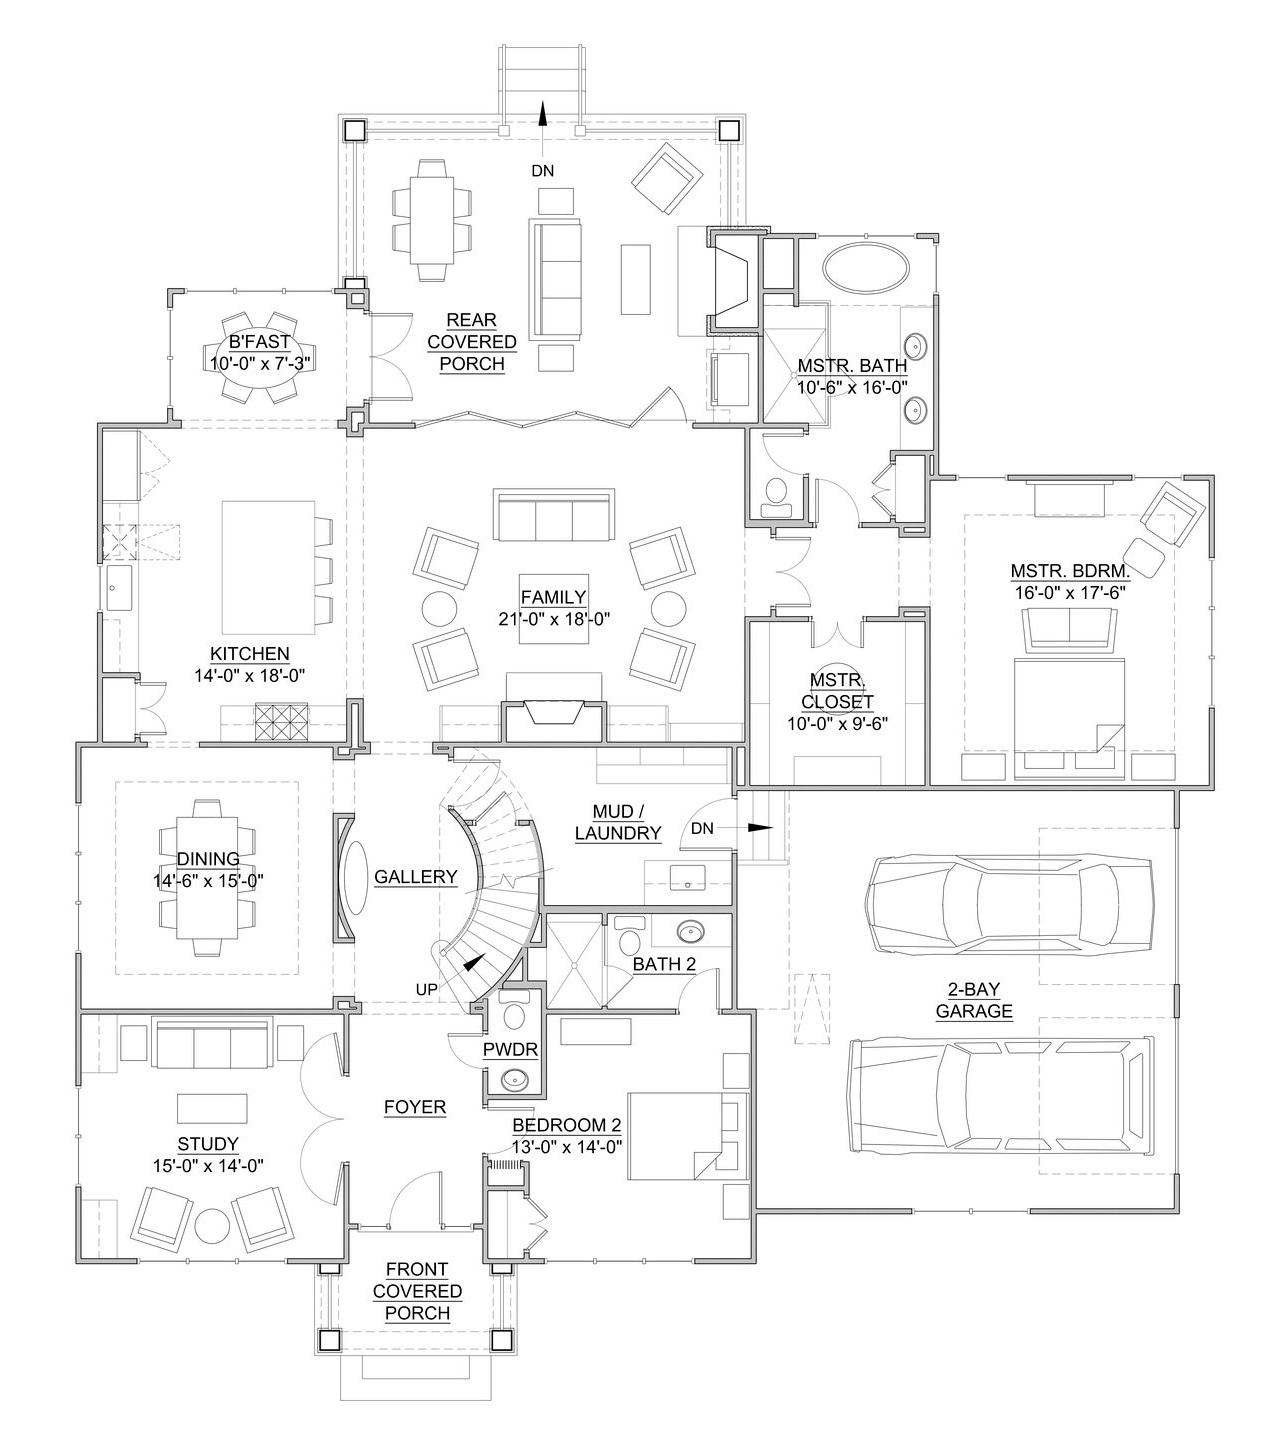 Riverchase_Christman A CRAWL_(2) First Floor Plan [24x36].jpg